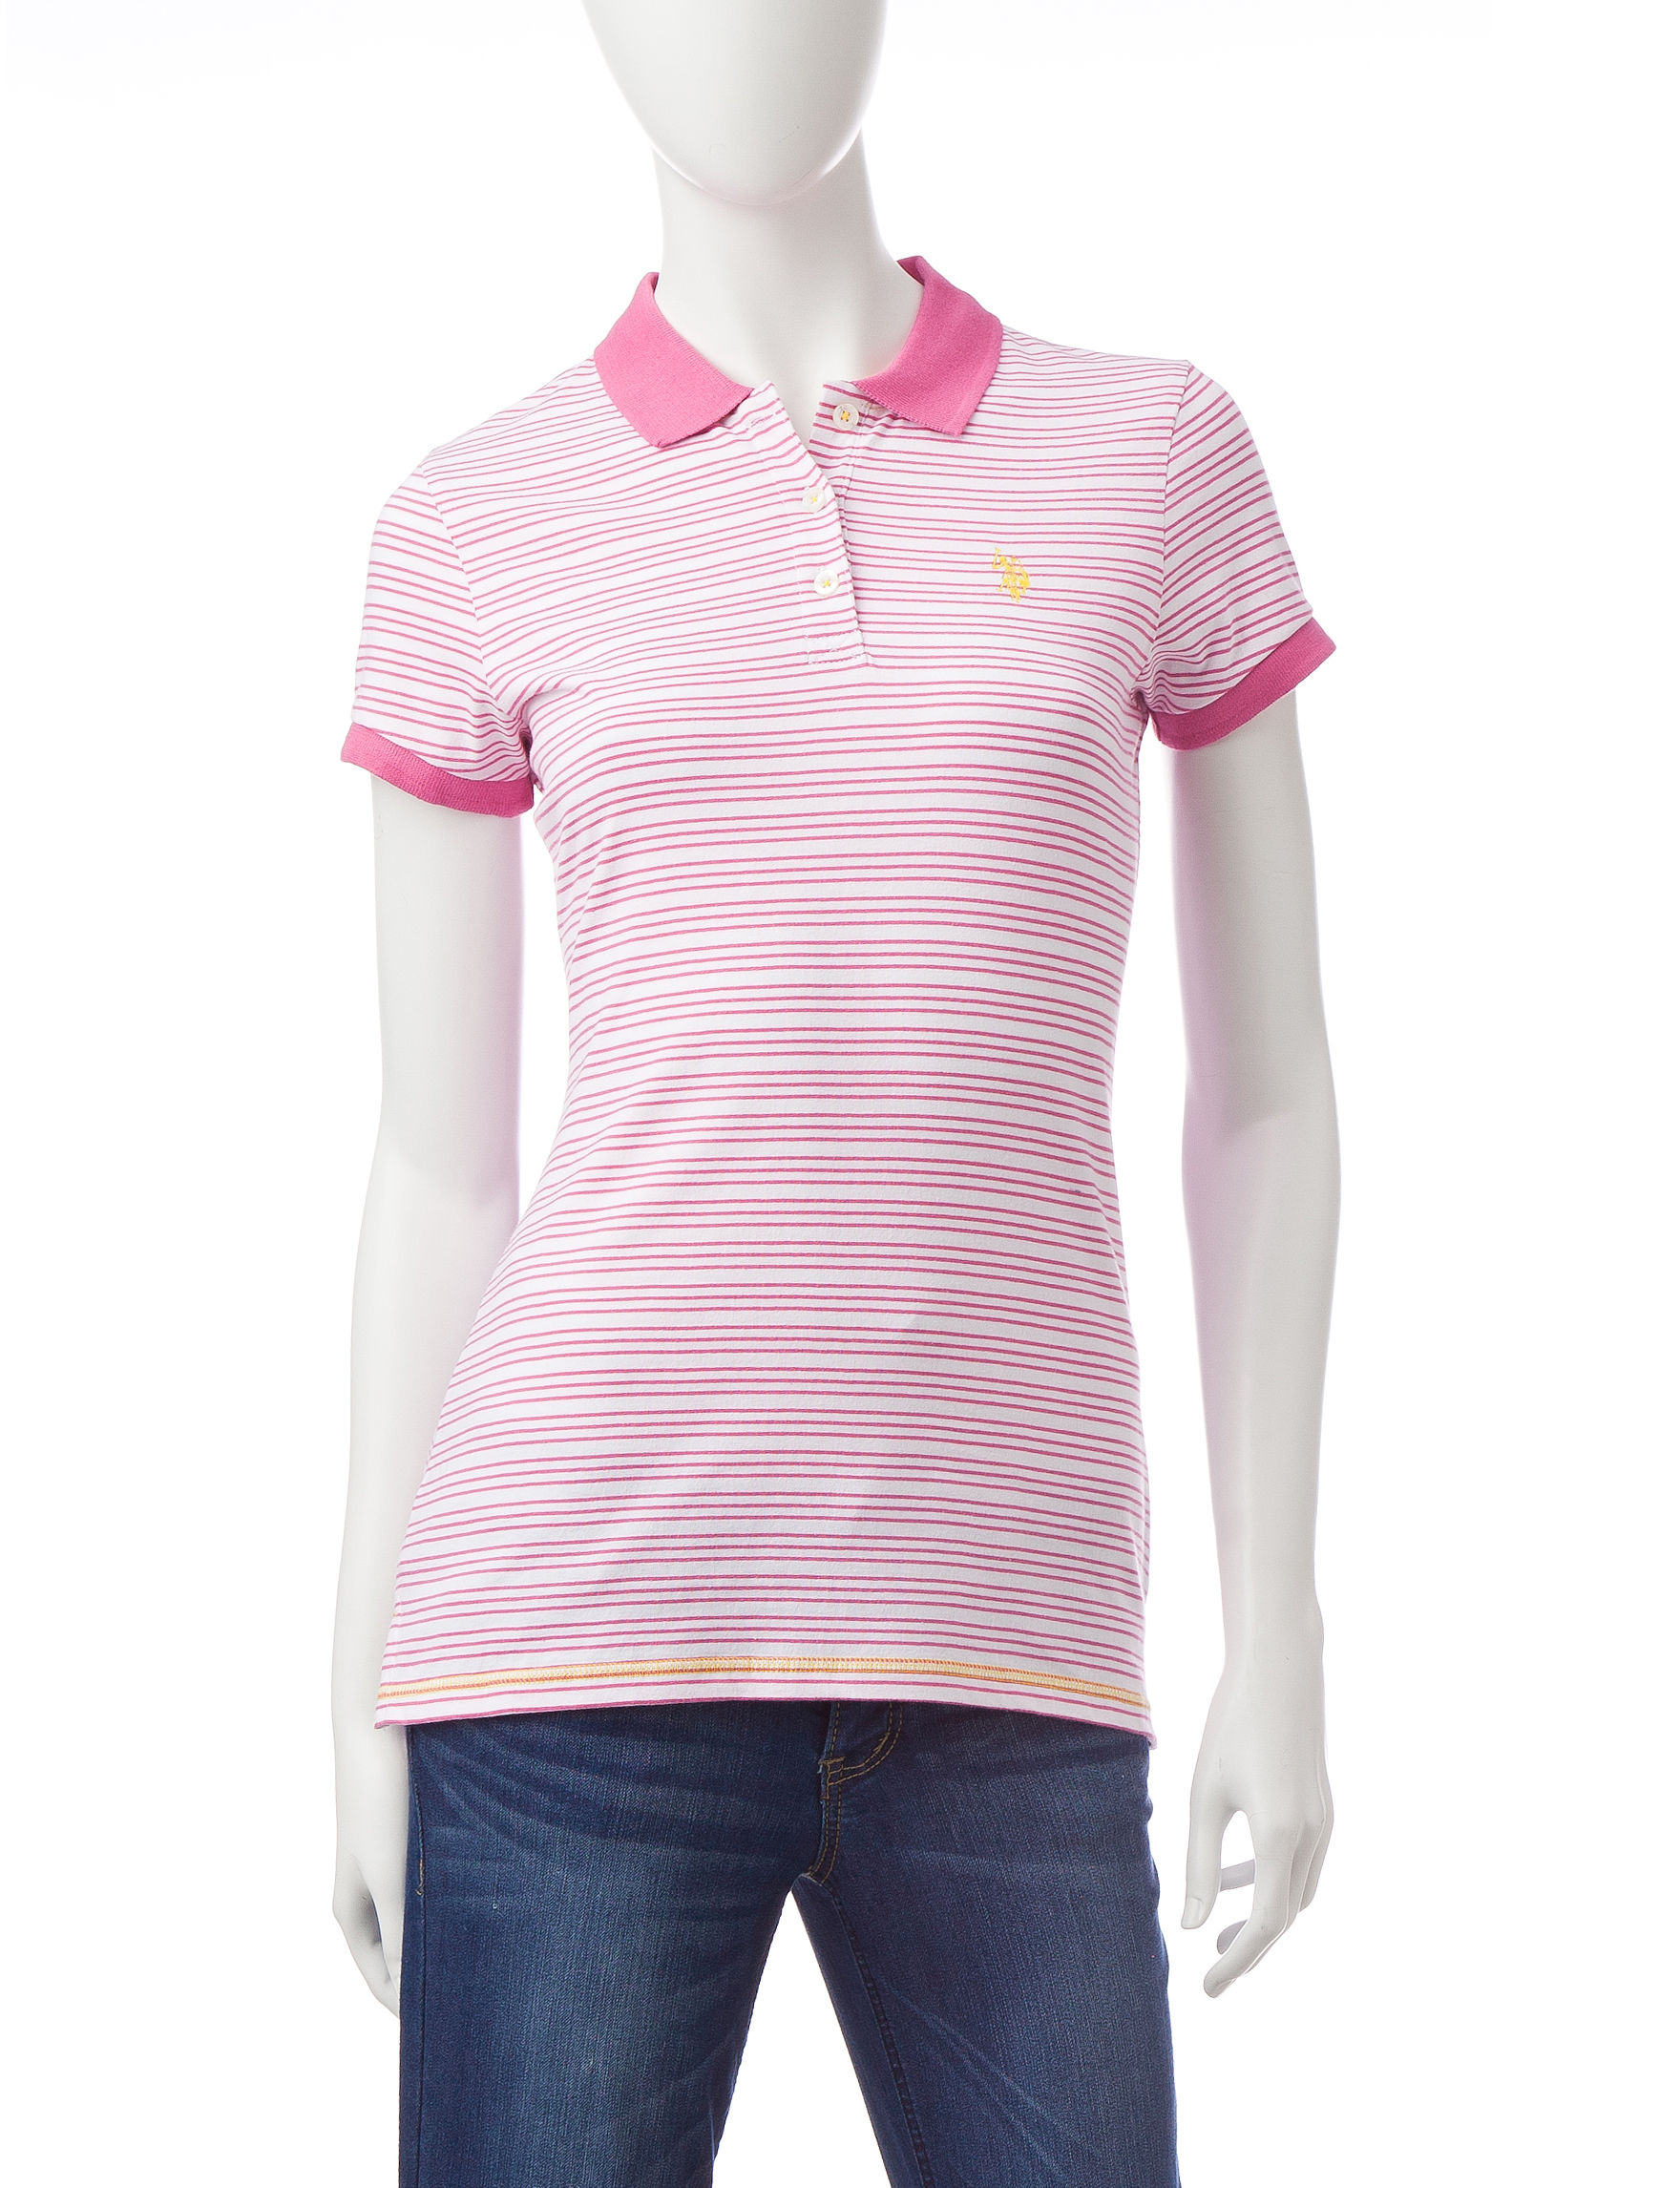 U.S. Polo Assn. Medium Pink Polos